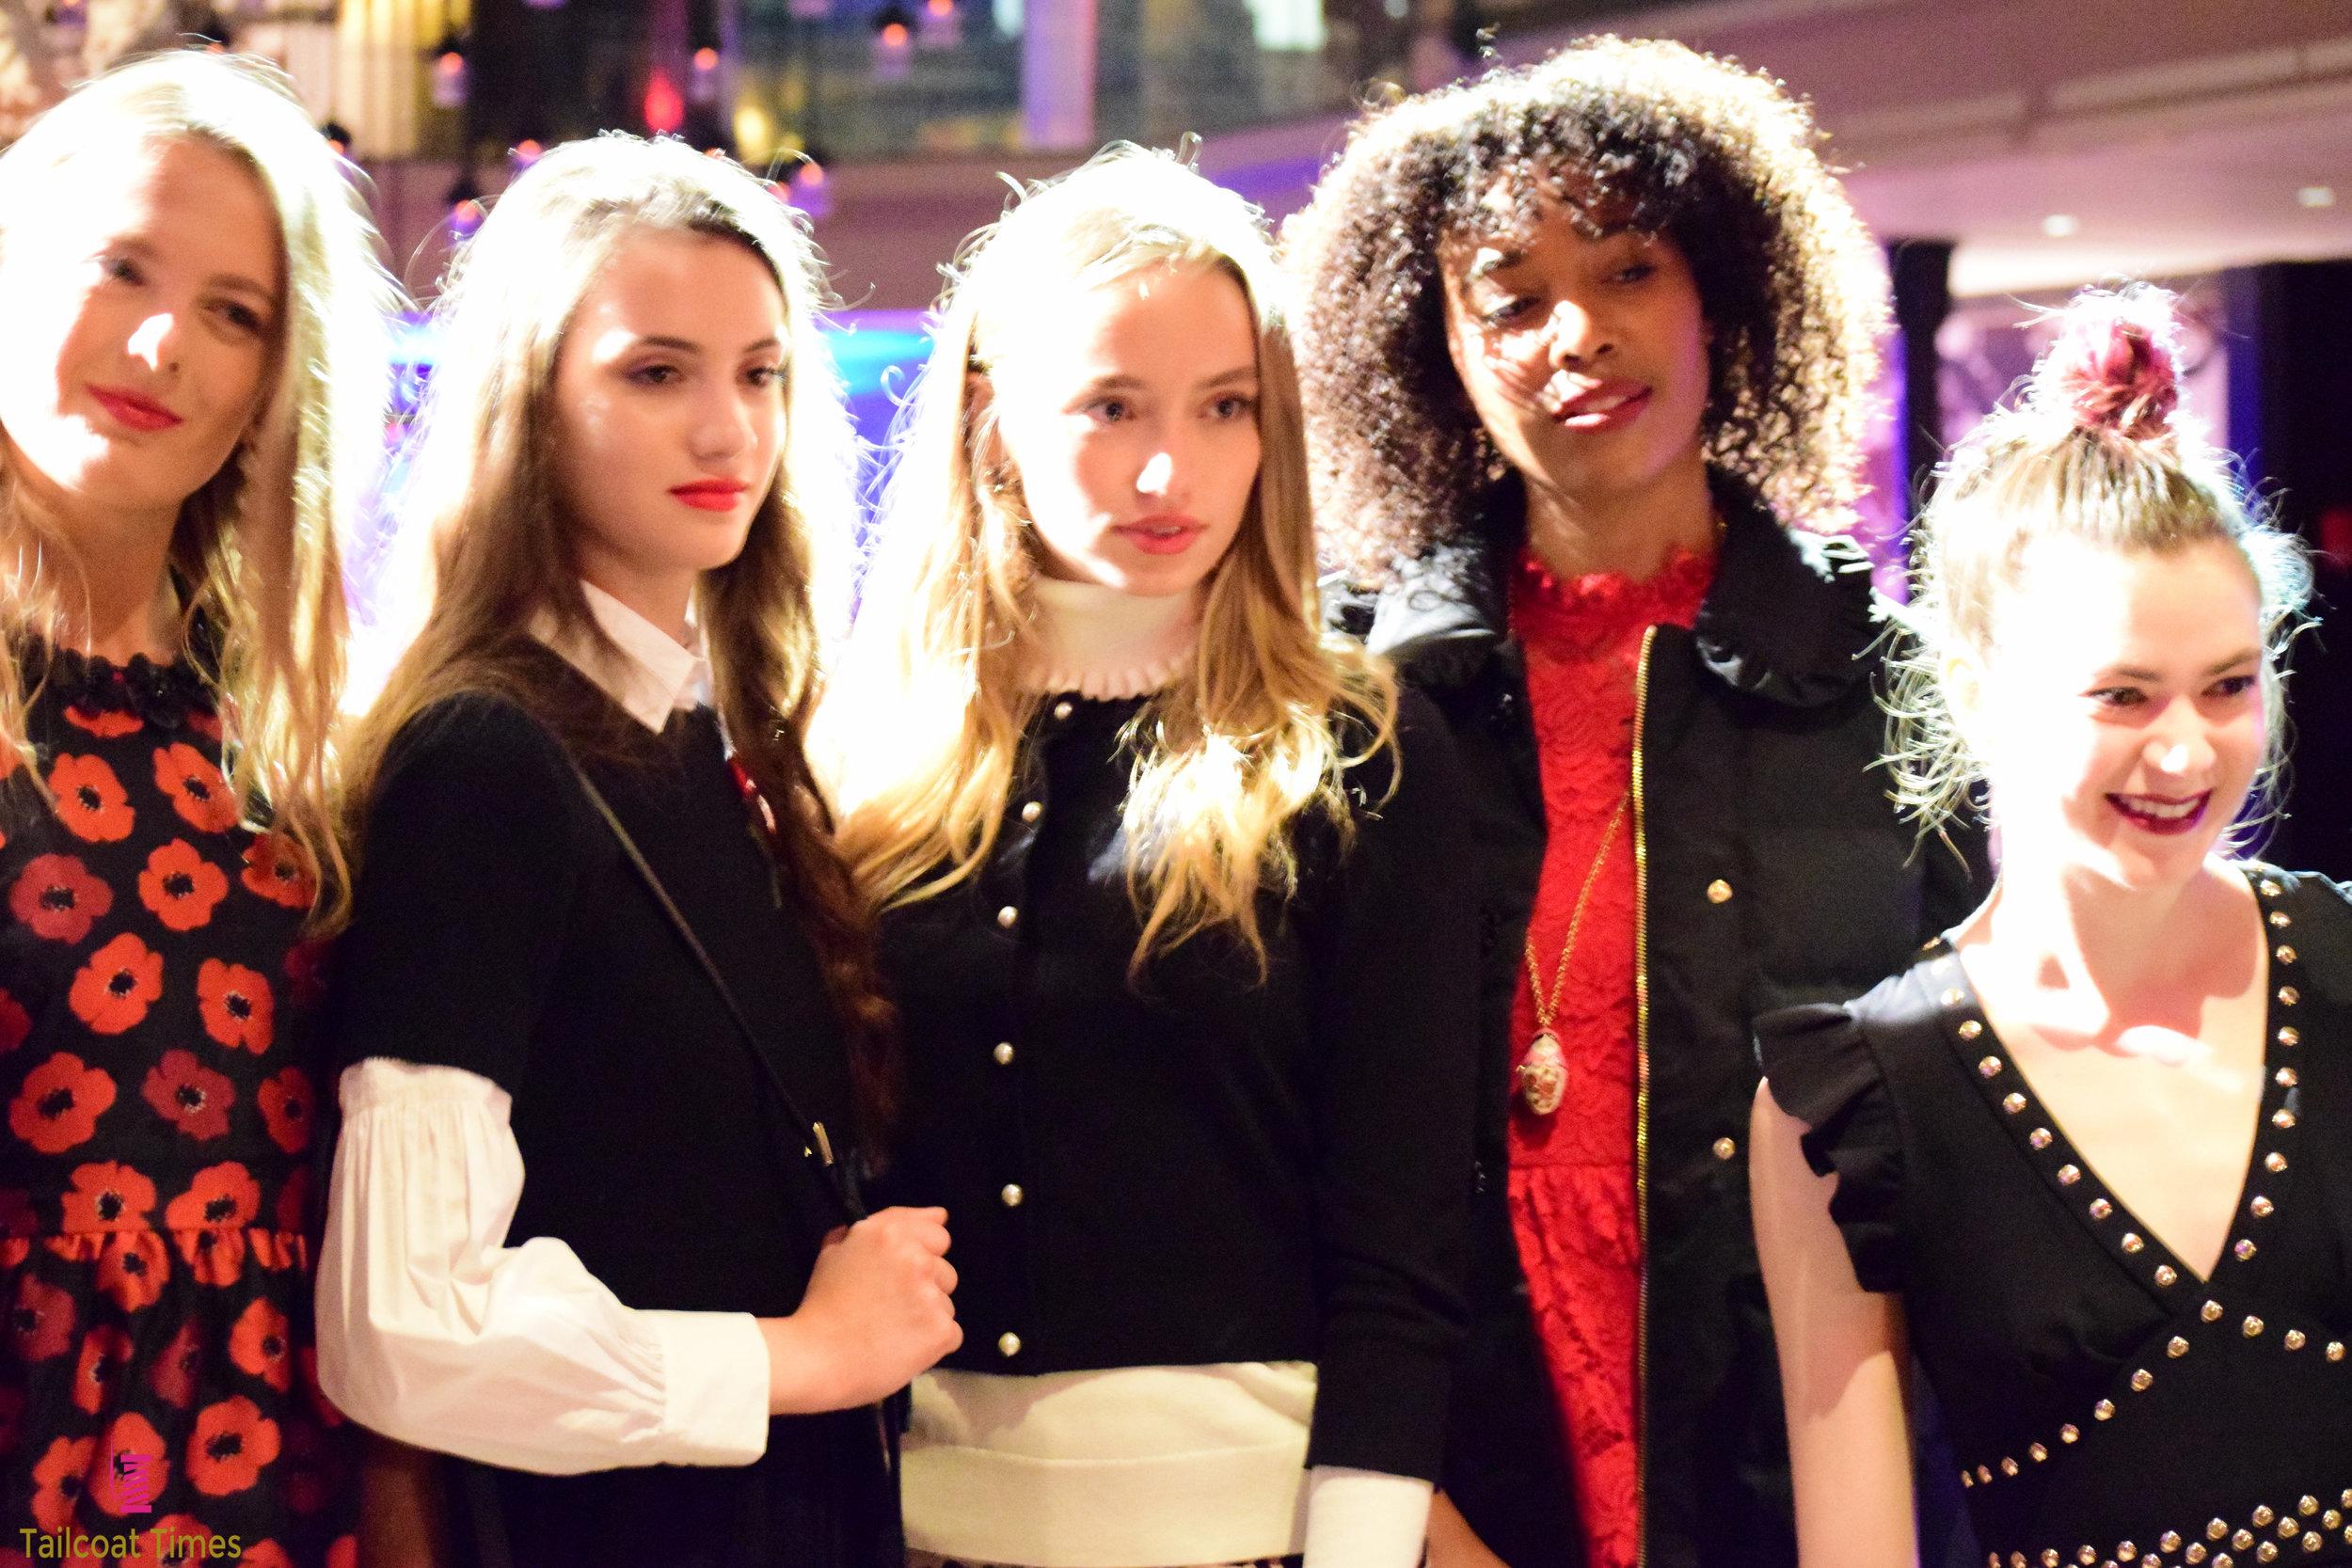 FashionablyLate_Kate Spade_Tailcoat Times (8 of 23).jpg